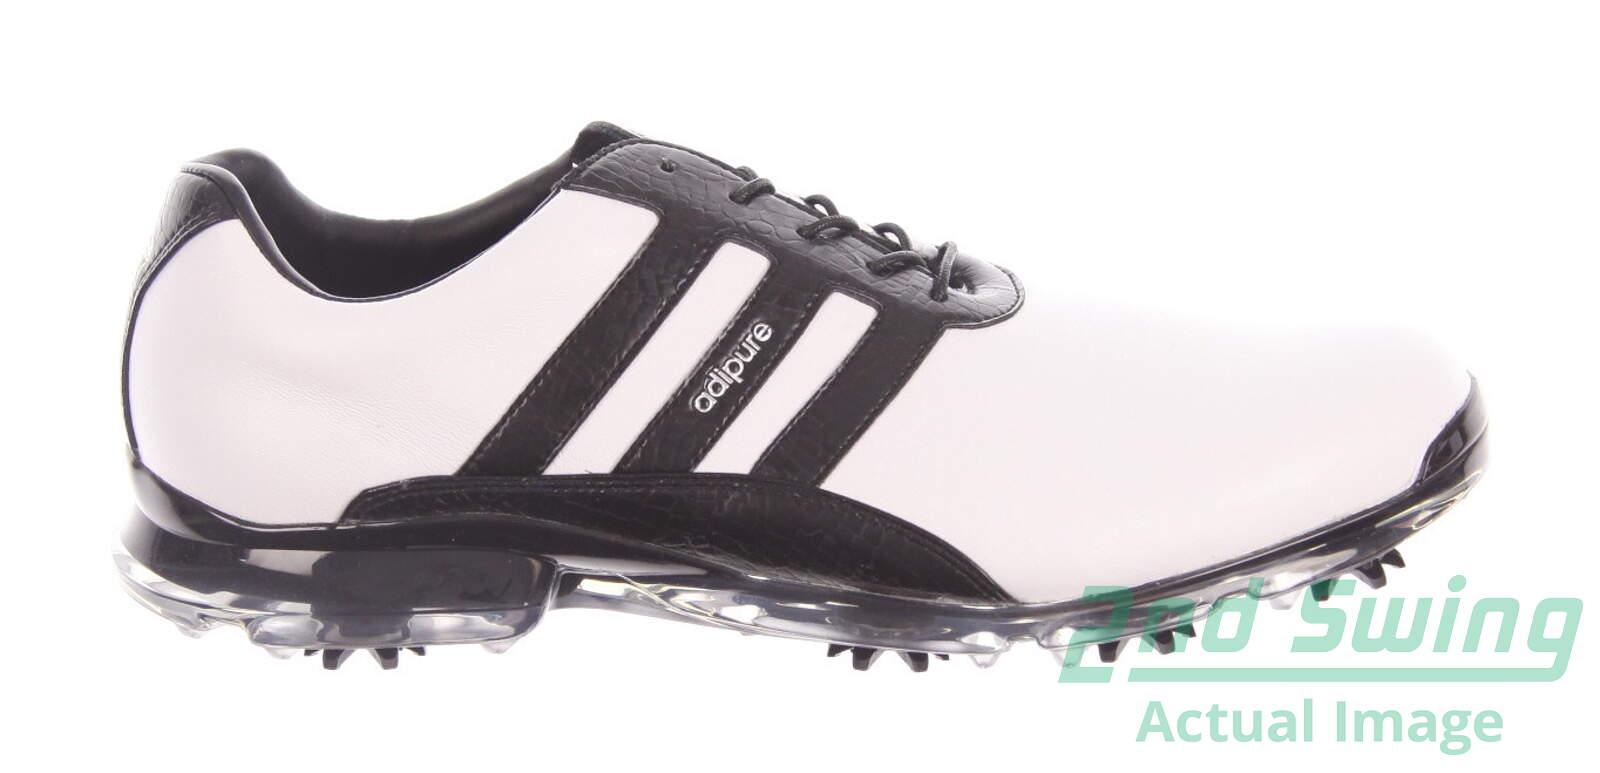 the best attitude 8a0d3 4fb12 New Mens Golf Shoe Adidas Adipure Classic Medium 11 WhiteBlack MSRP 170  Q44839 - Golf Footwear